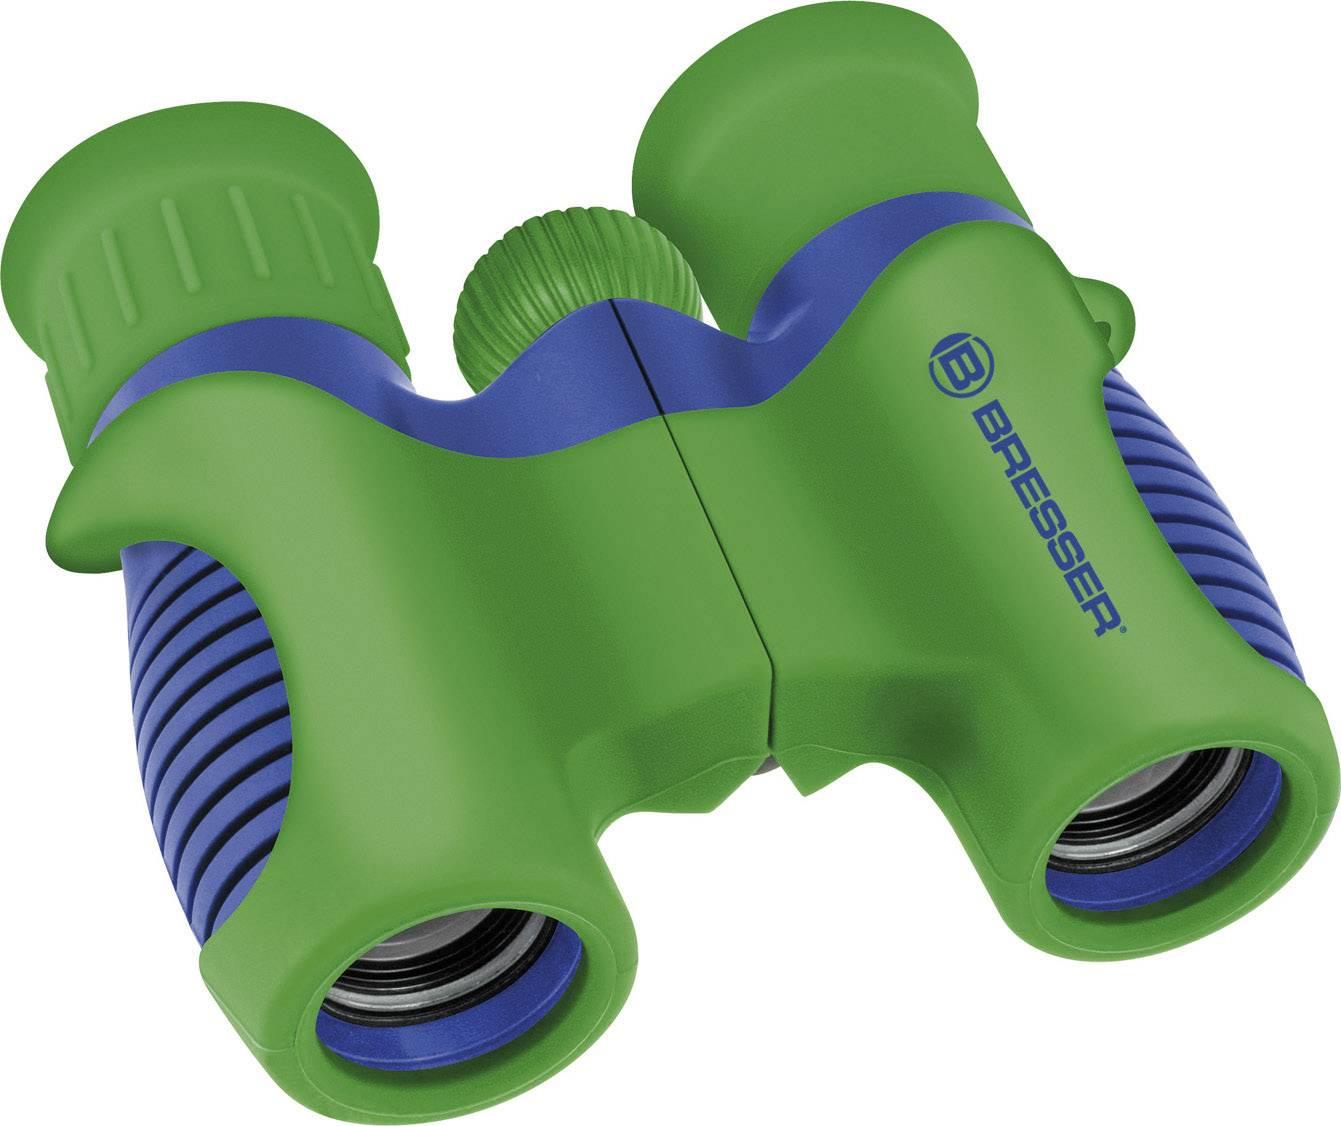 Dětský dalekohled Bresser Optik Junior 6 x 21 mm, modrozelená